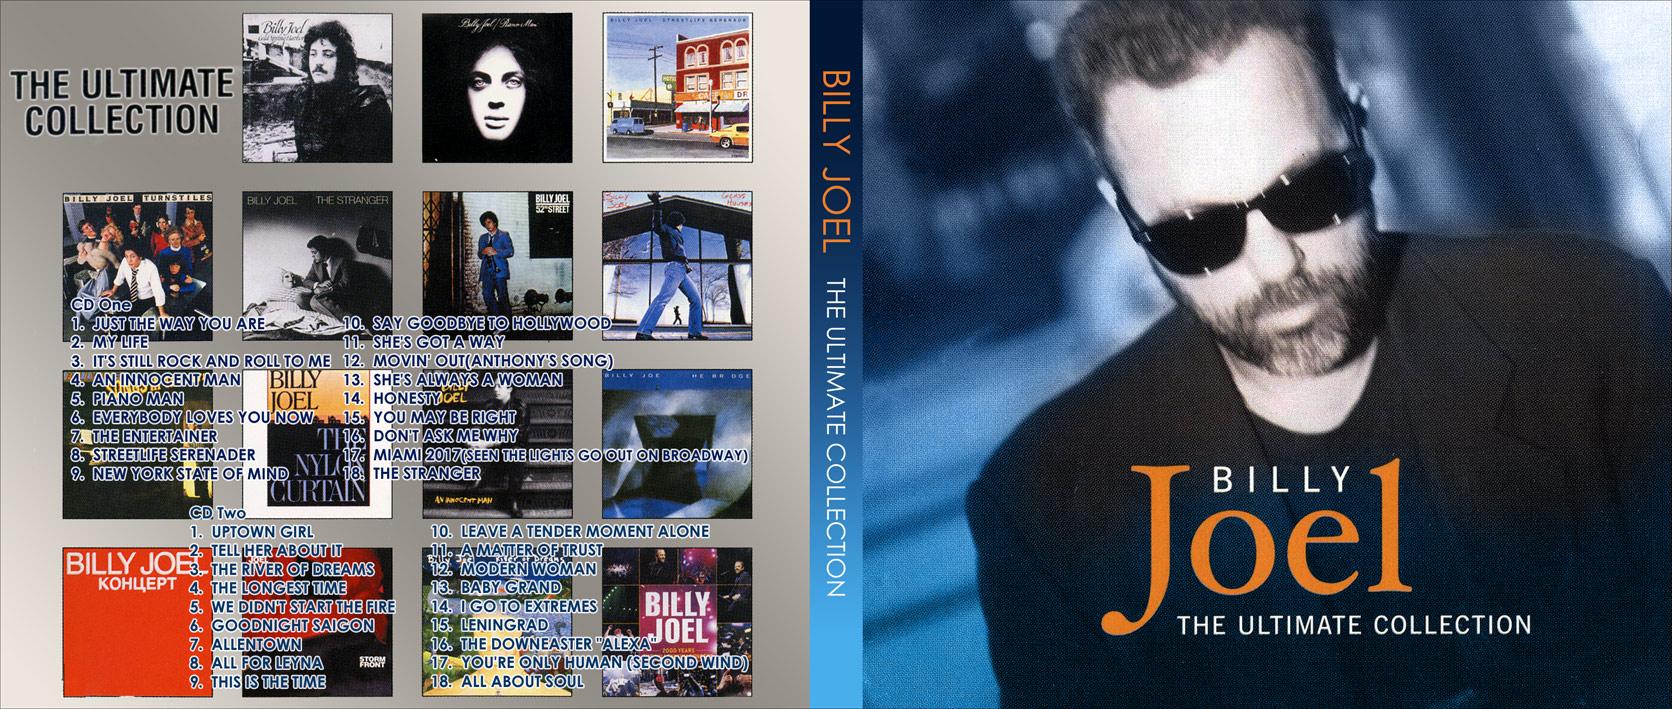 Billy Joel Ultimate Collection: Tanapapa 自作ラベル保管庫 BILLY JOEL ~ THE ULTIMATE COLLECTION